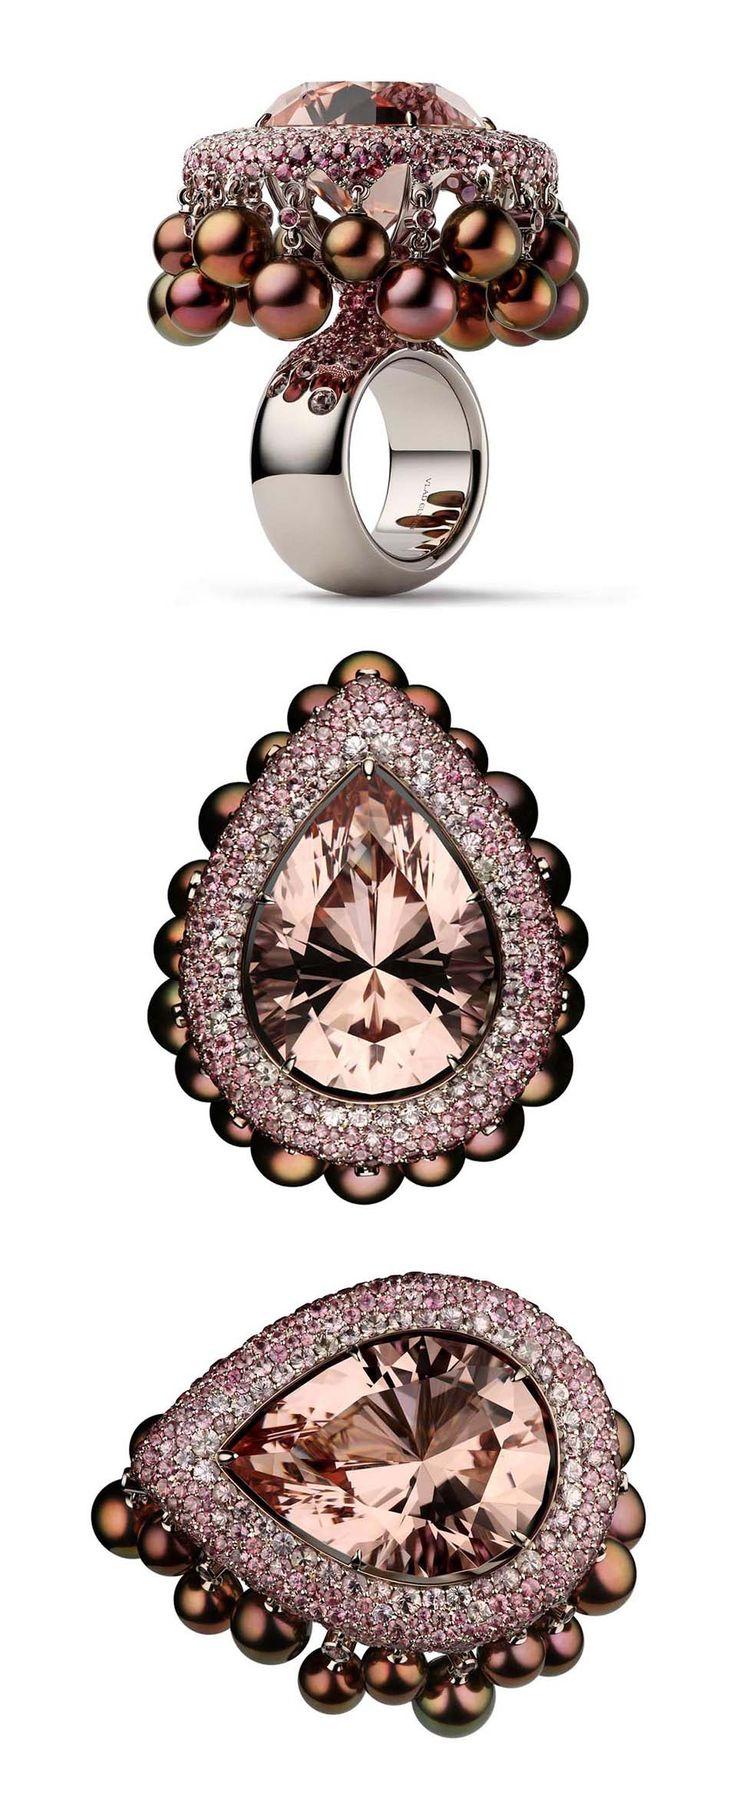 "VLAD GLYNIN jewellery - Ring ""Pomegranate & Mint"", 2016. White gold, morganite, sapphires, pearls. / Кольцо «Гранат и мята», 2016 г. Белое золото, морганит, сапфиры, жемчуг. / Anello «Melograno e menta», 2016. Oro bianco, morganite, zaffiri, perle."